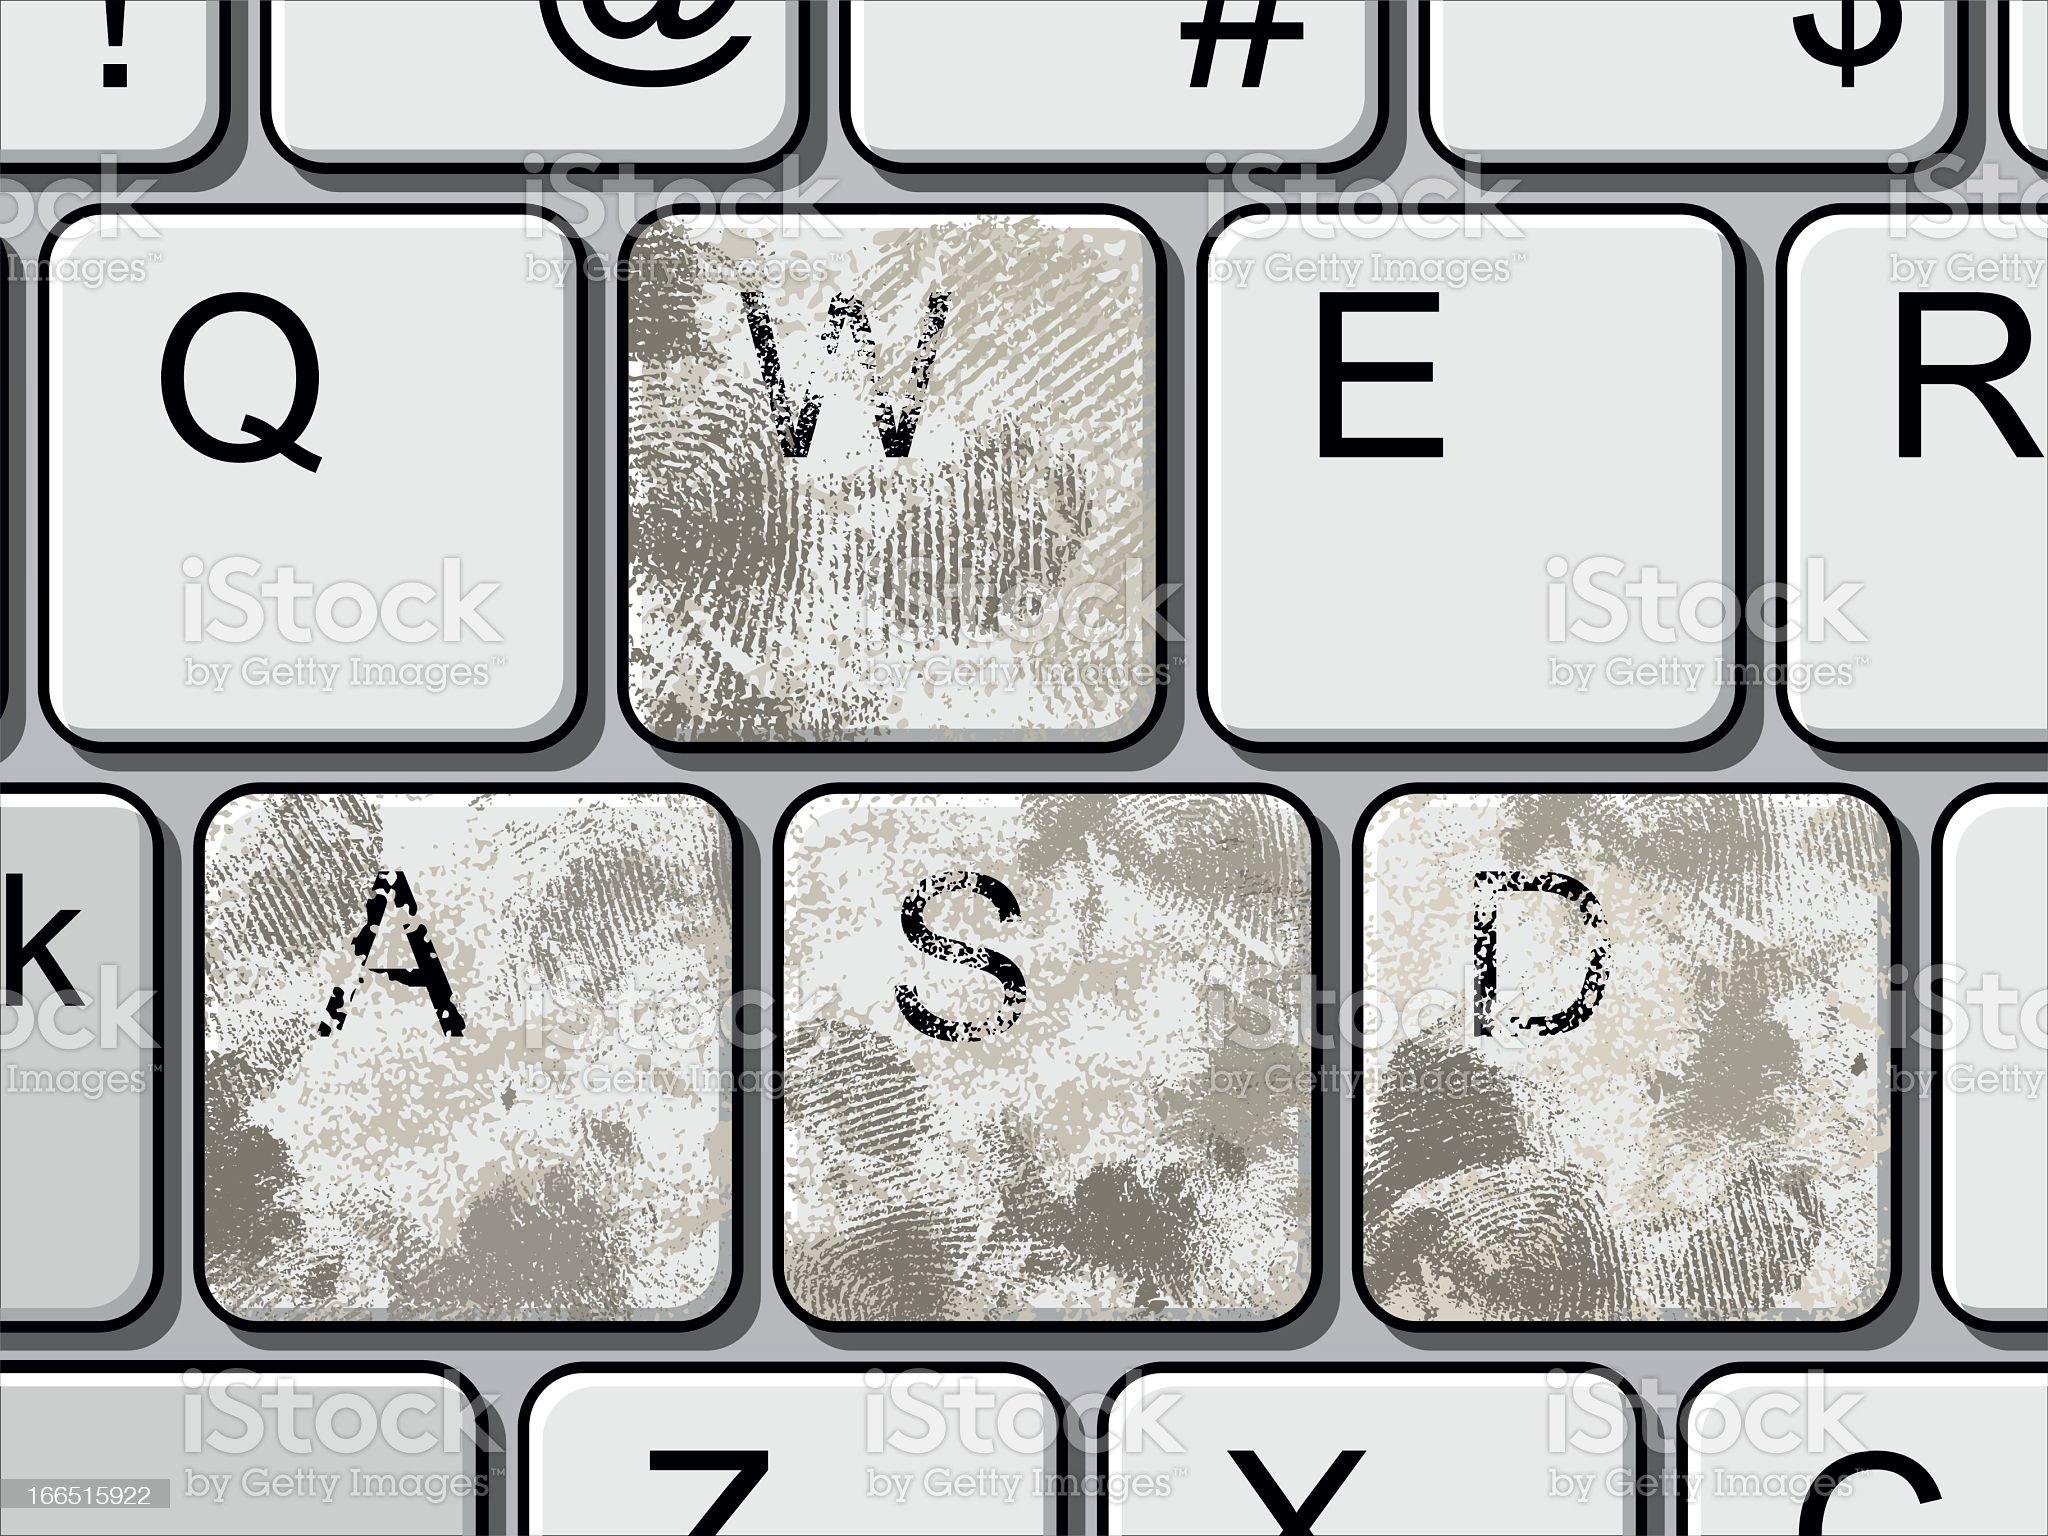 Extreme Dirty Gaming Keyboard royalty-free stock vector art